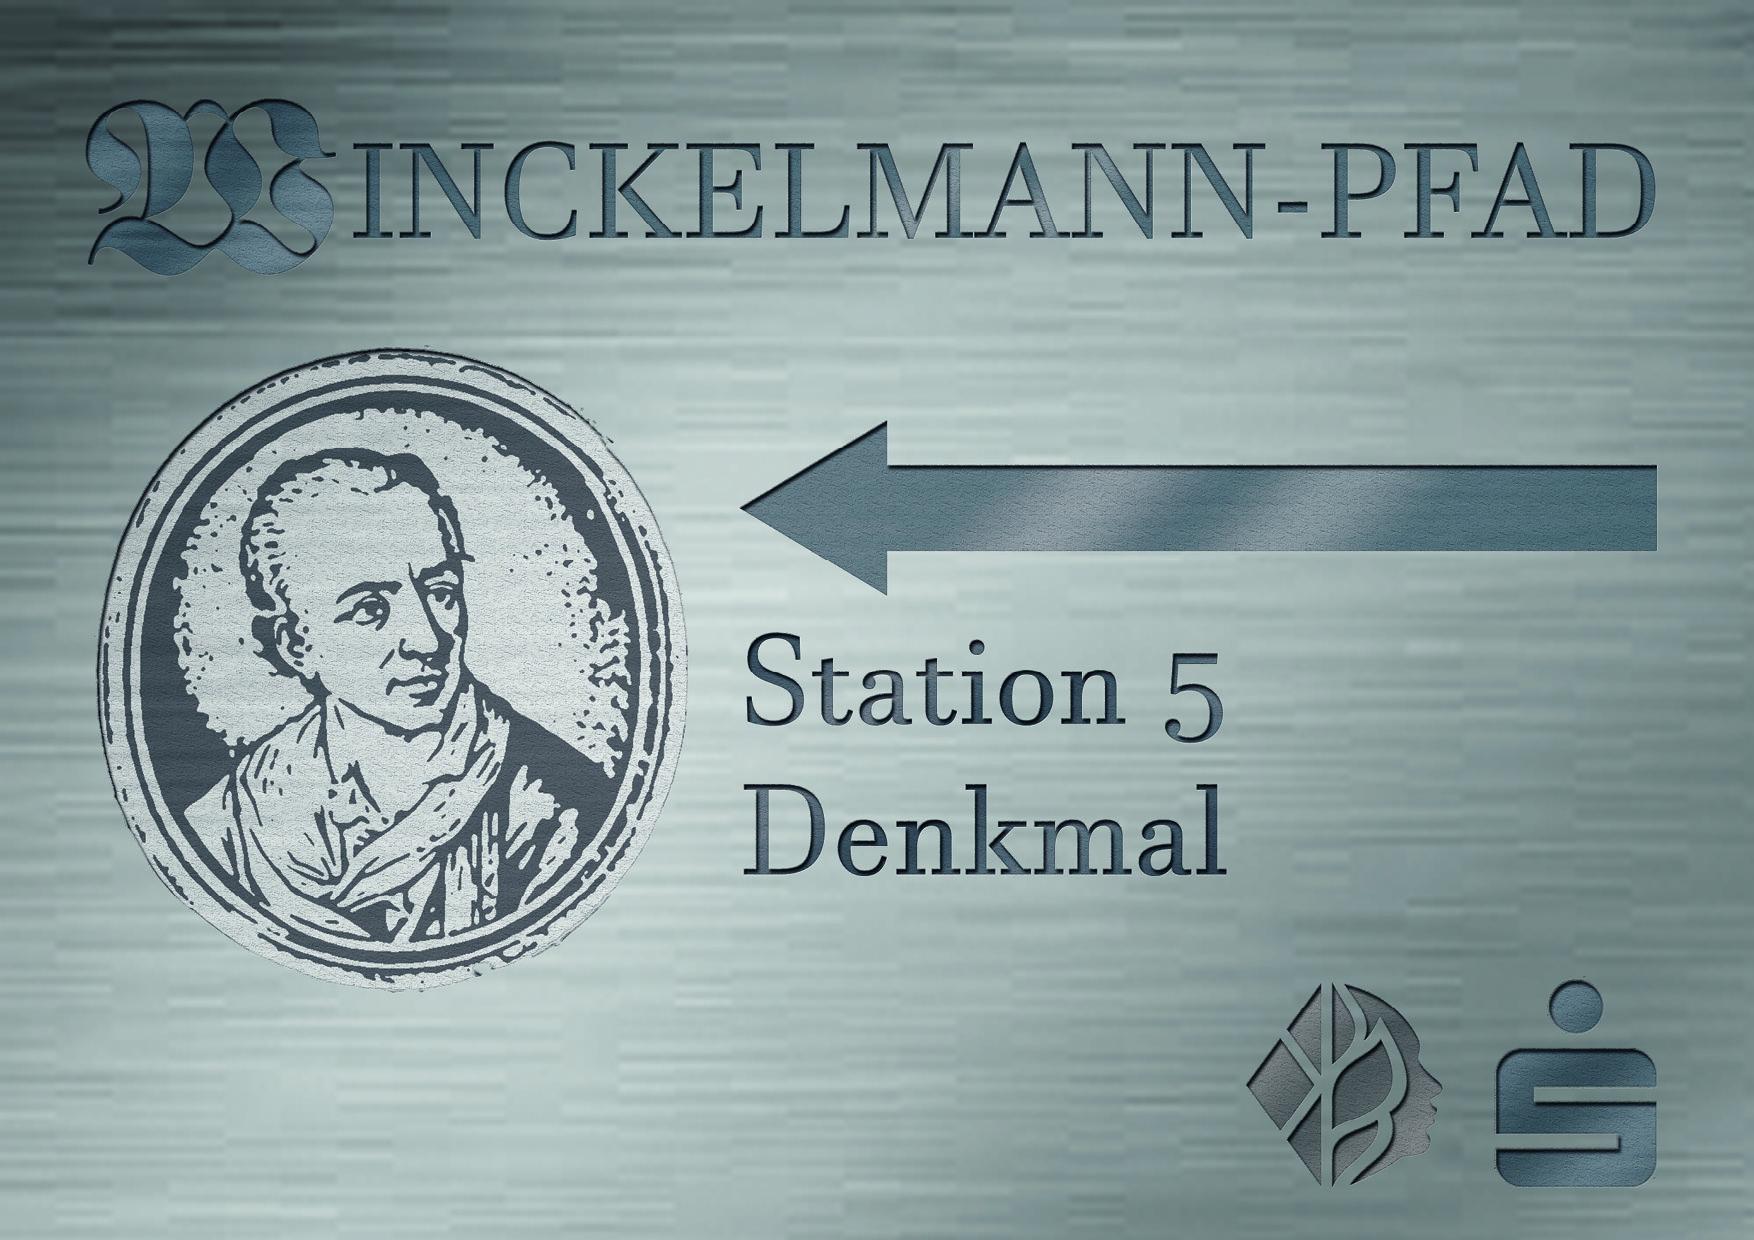 Winckelmann-Pfad Station 5